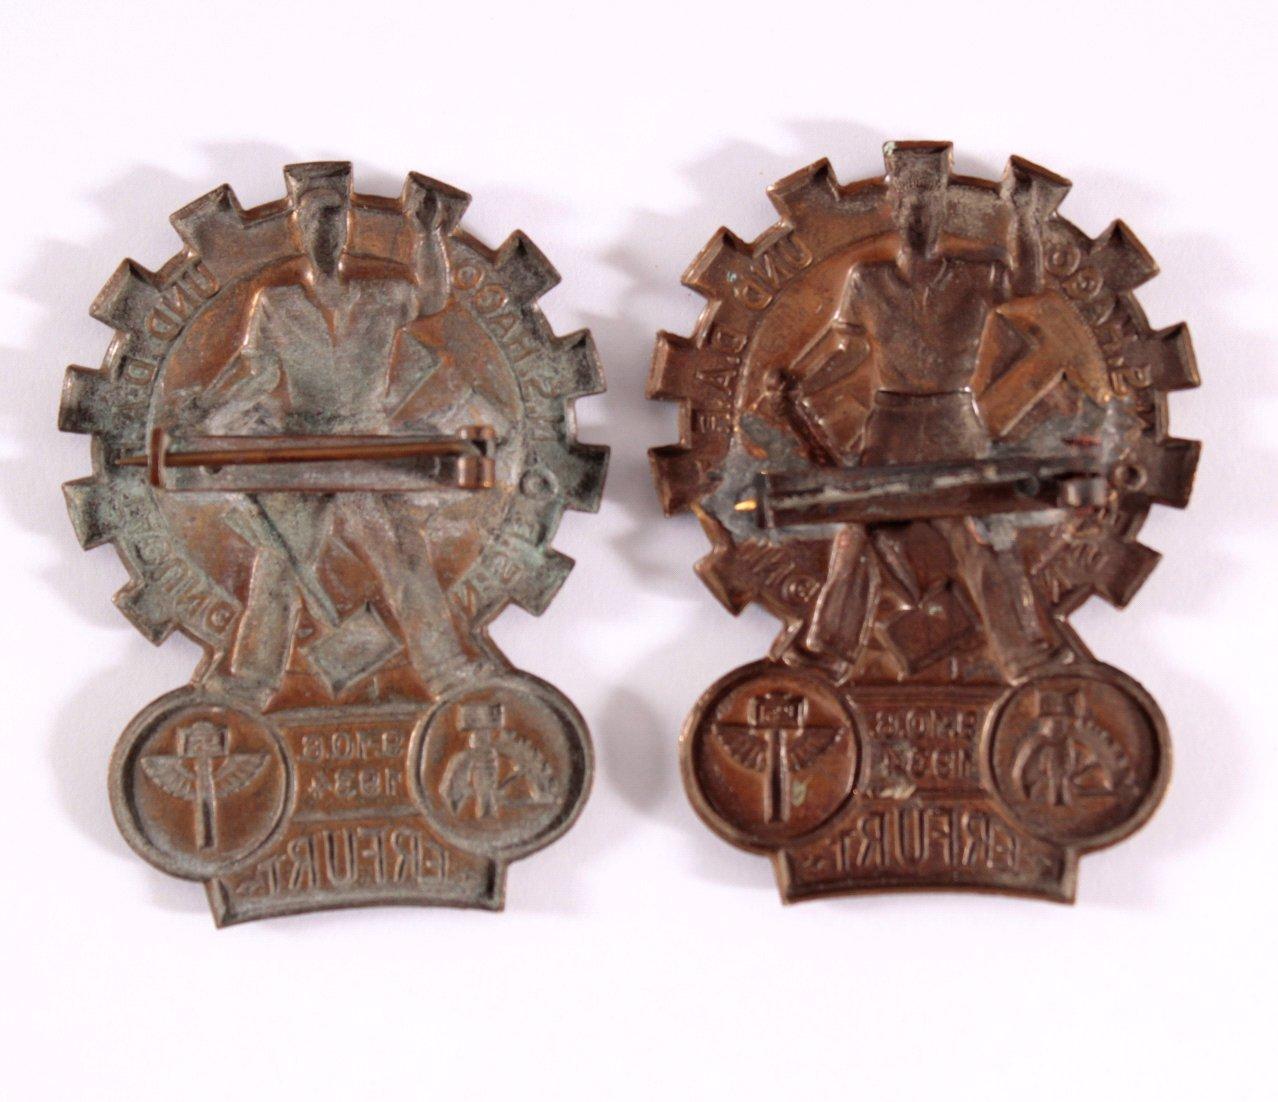 2 Abzeichen N.S.B.O., N.S.Hago und D.A.F. Tagung Erfurt 1934-1